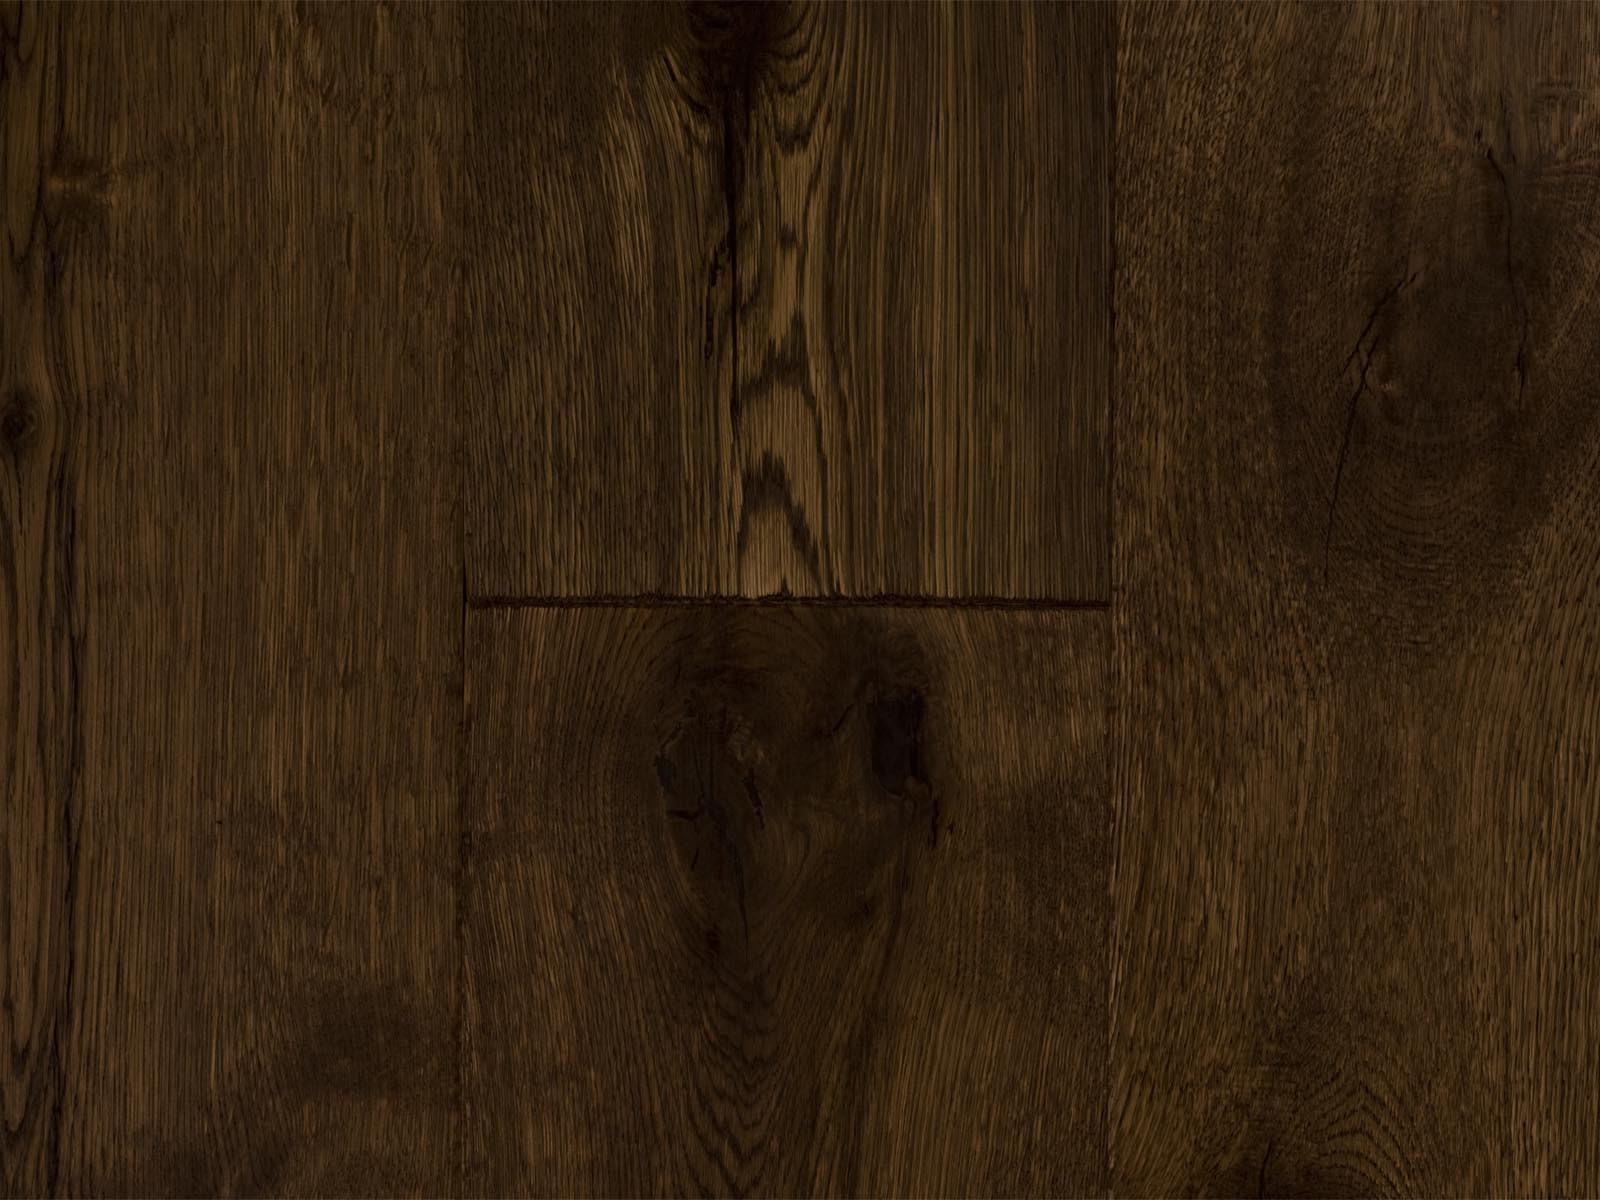 lauzon hardwood flooring reviews of american relics collection hfcentre inside windsor european oak